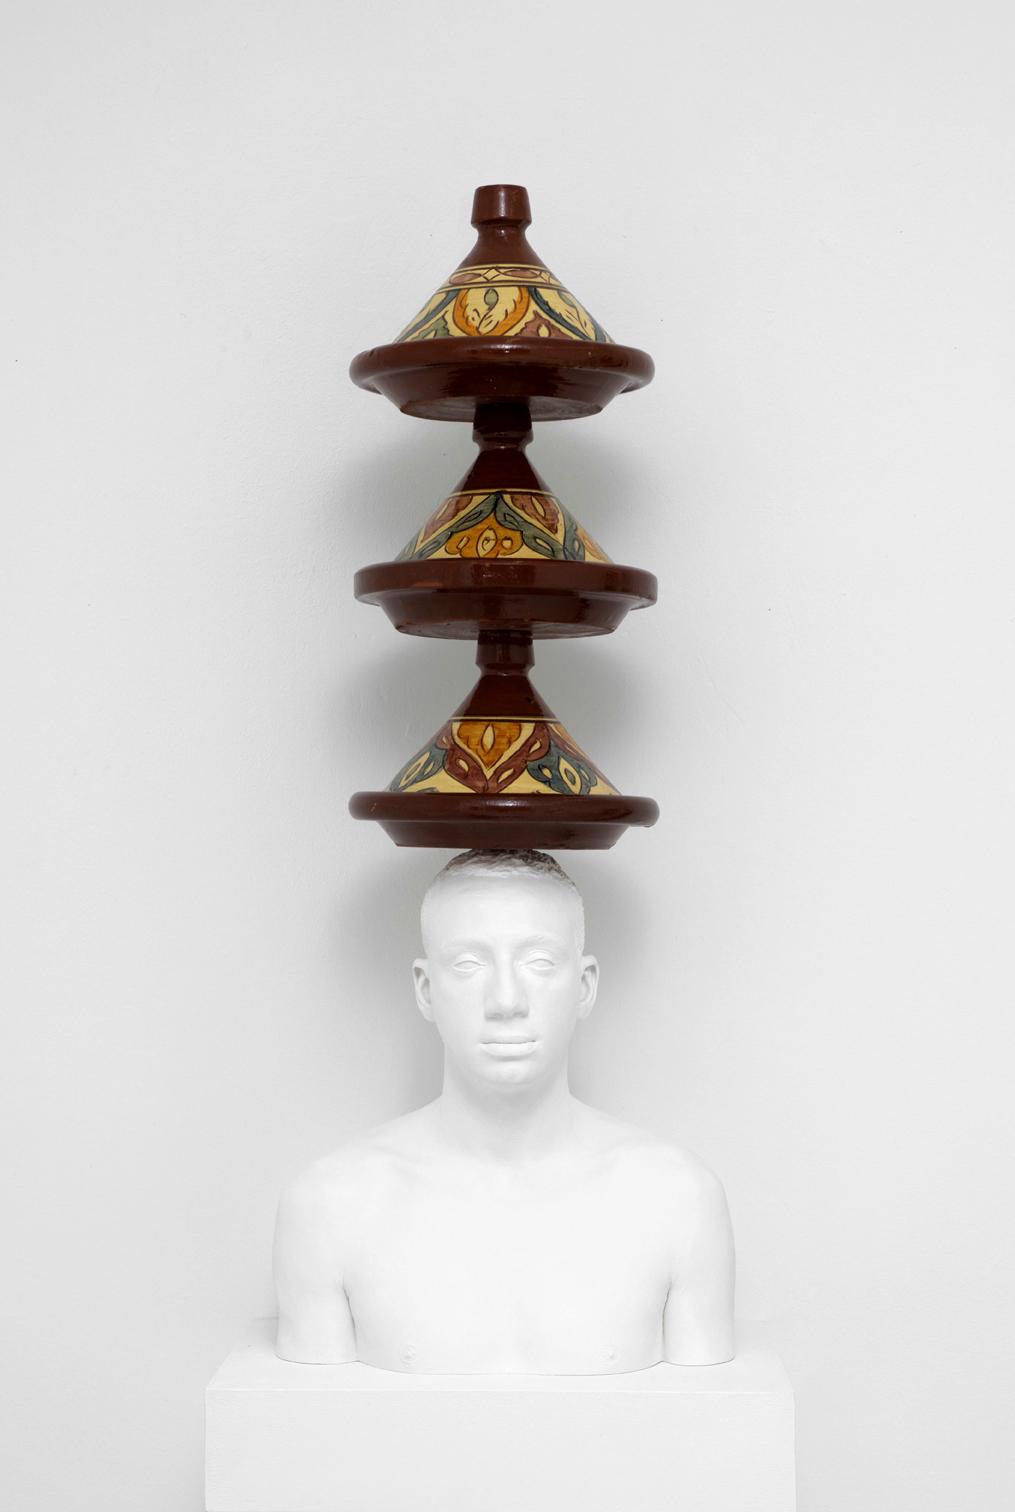 Mehdi-Georges Lahlou, Equilibre aux tajines, 2012 - Courtesy the artist and Rabouan Moussion Gallery Paris